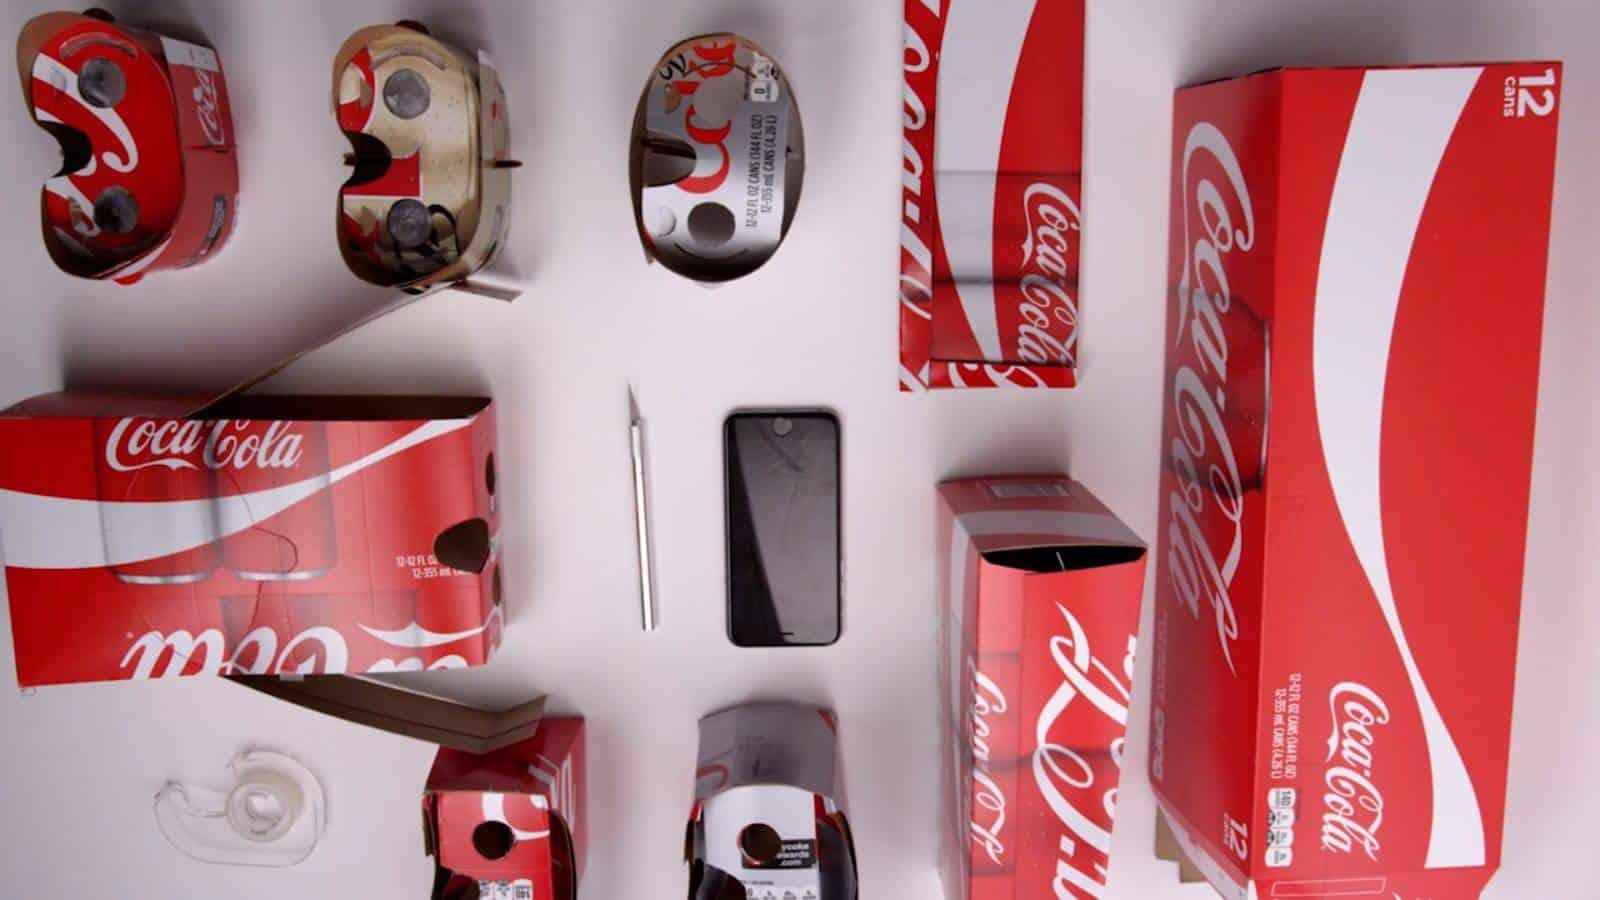 Coke Cola VR headsets